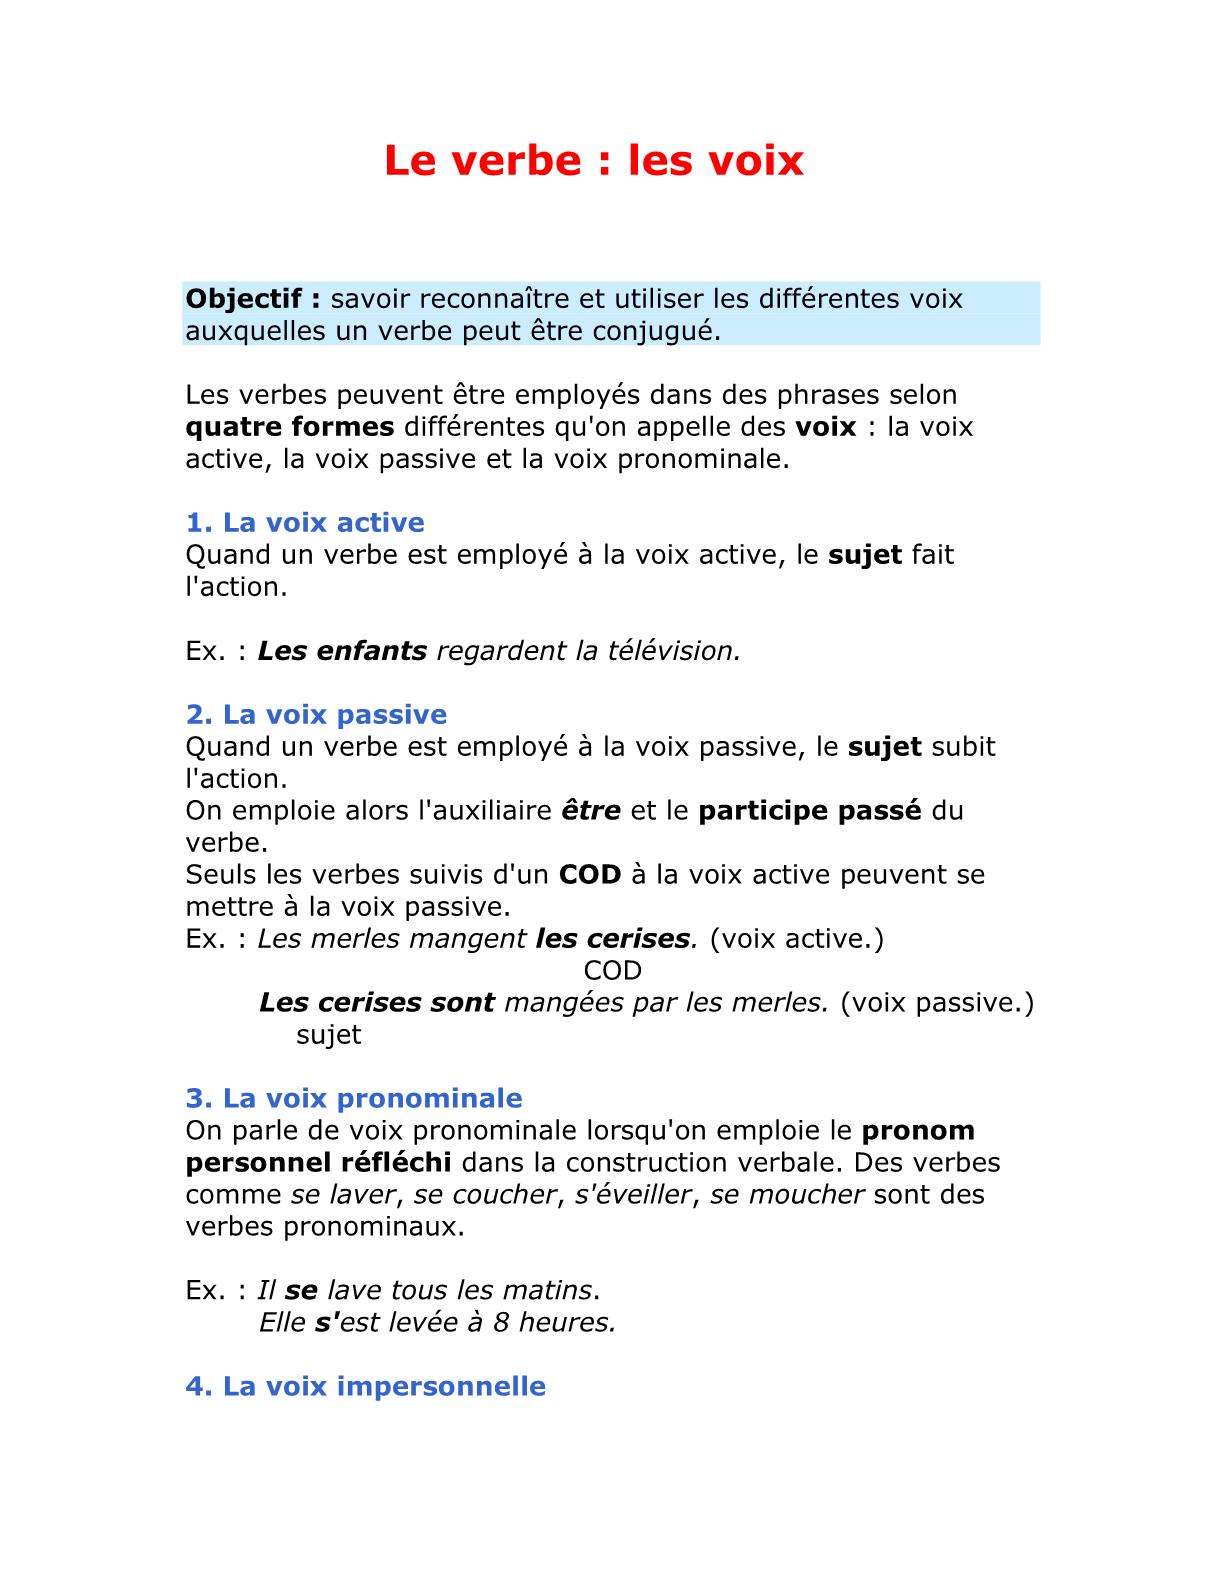 le verbe : les voix للسنة الأولى إعدادي